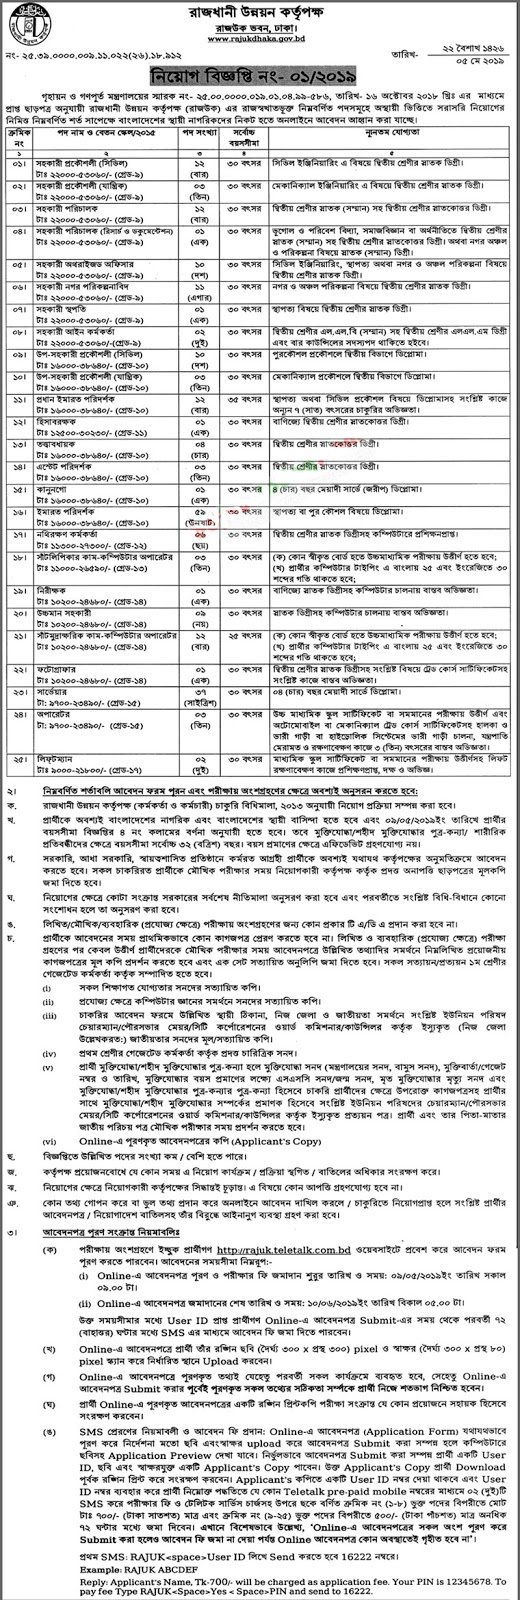 Rajdhani Unnayan Kartripakkha Job Circular 2019